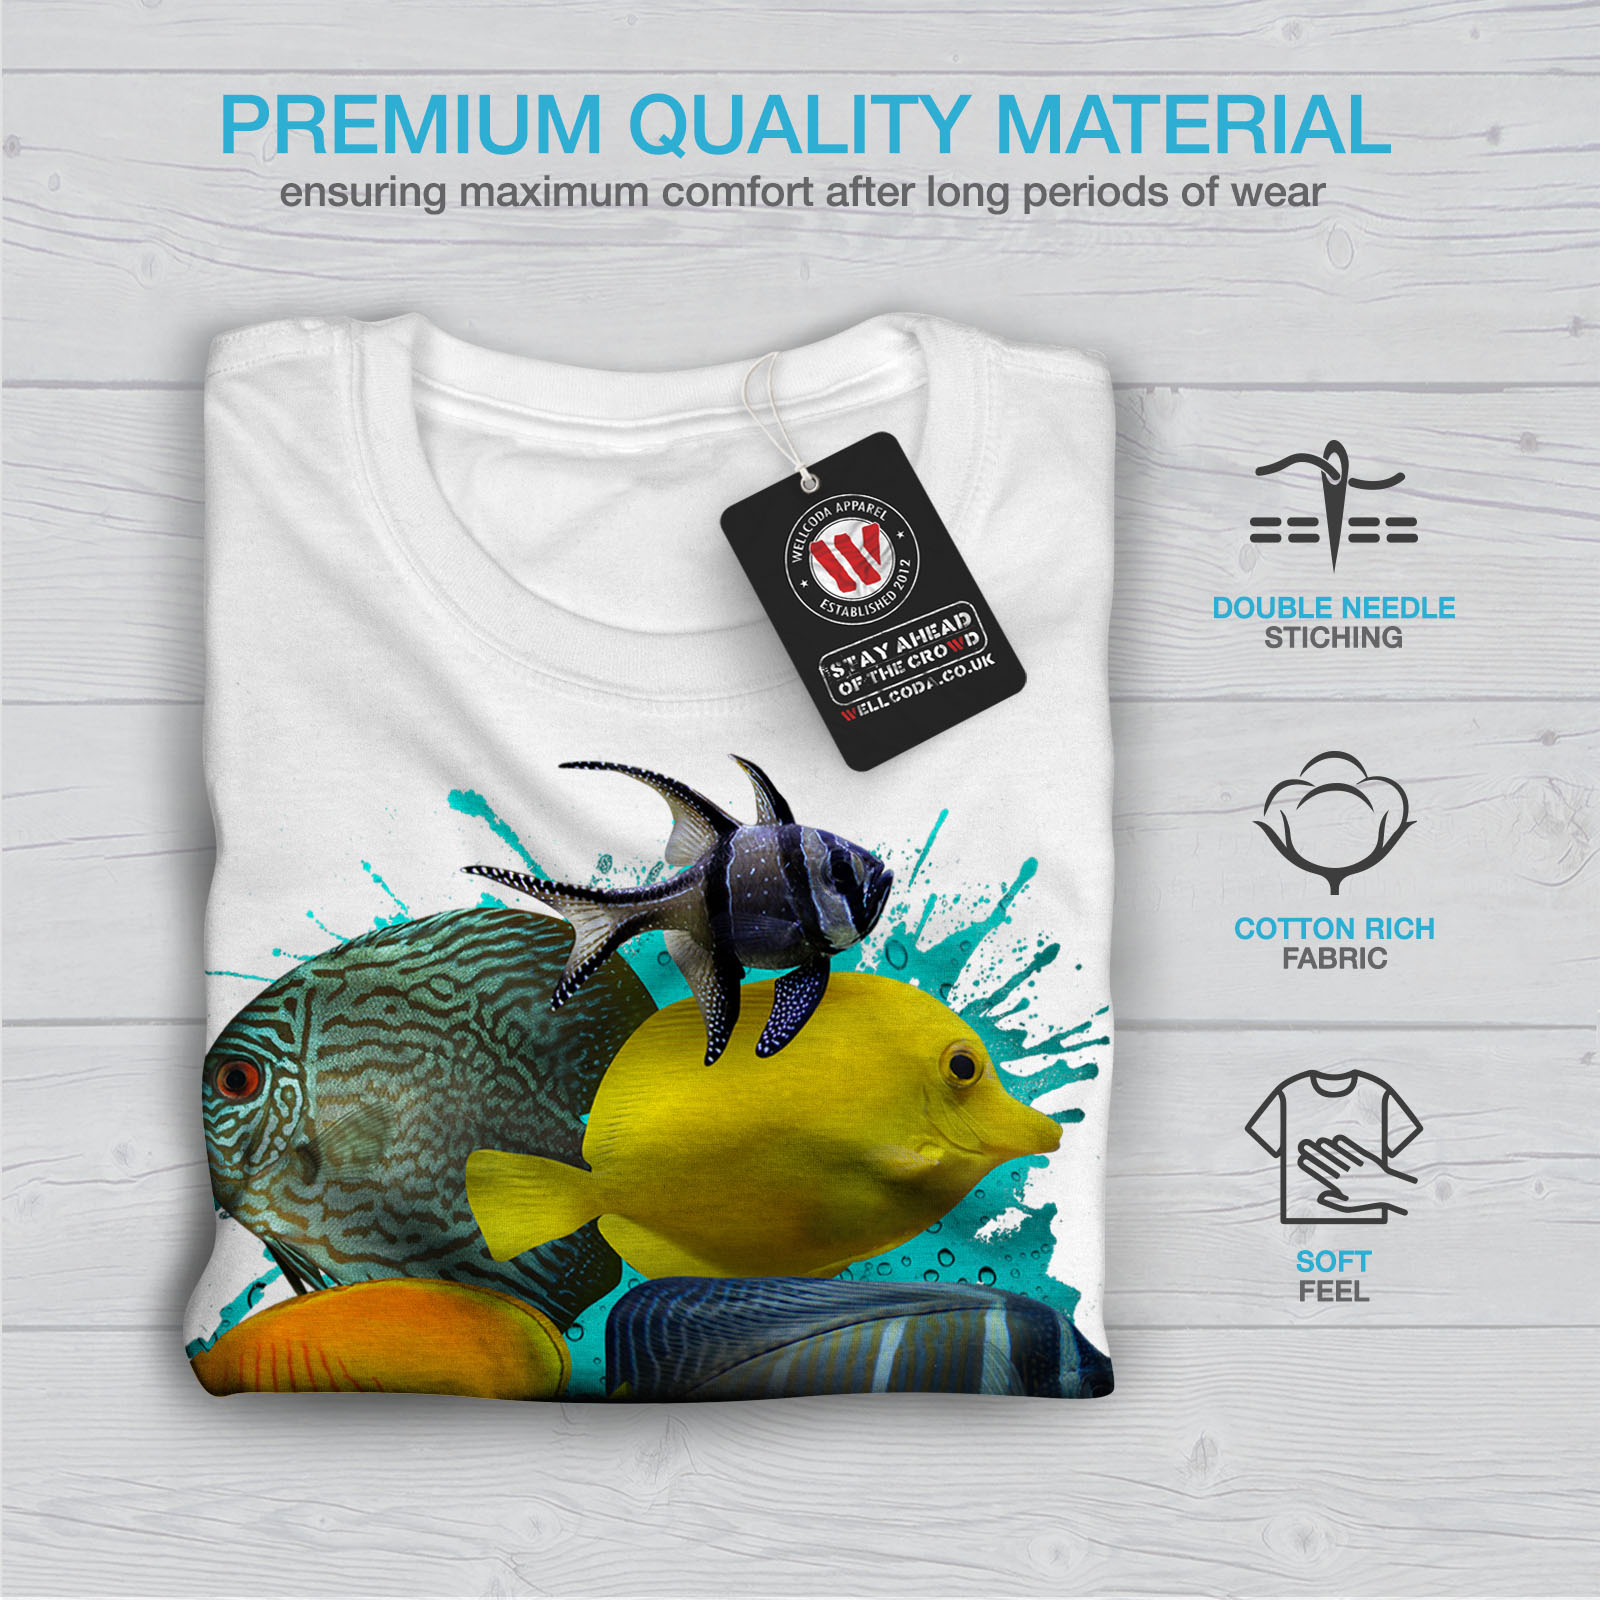 Wellcoda Sea Fish Nature Animal Mens T-shirt Water Graphic Design Printed Tee